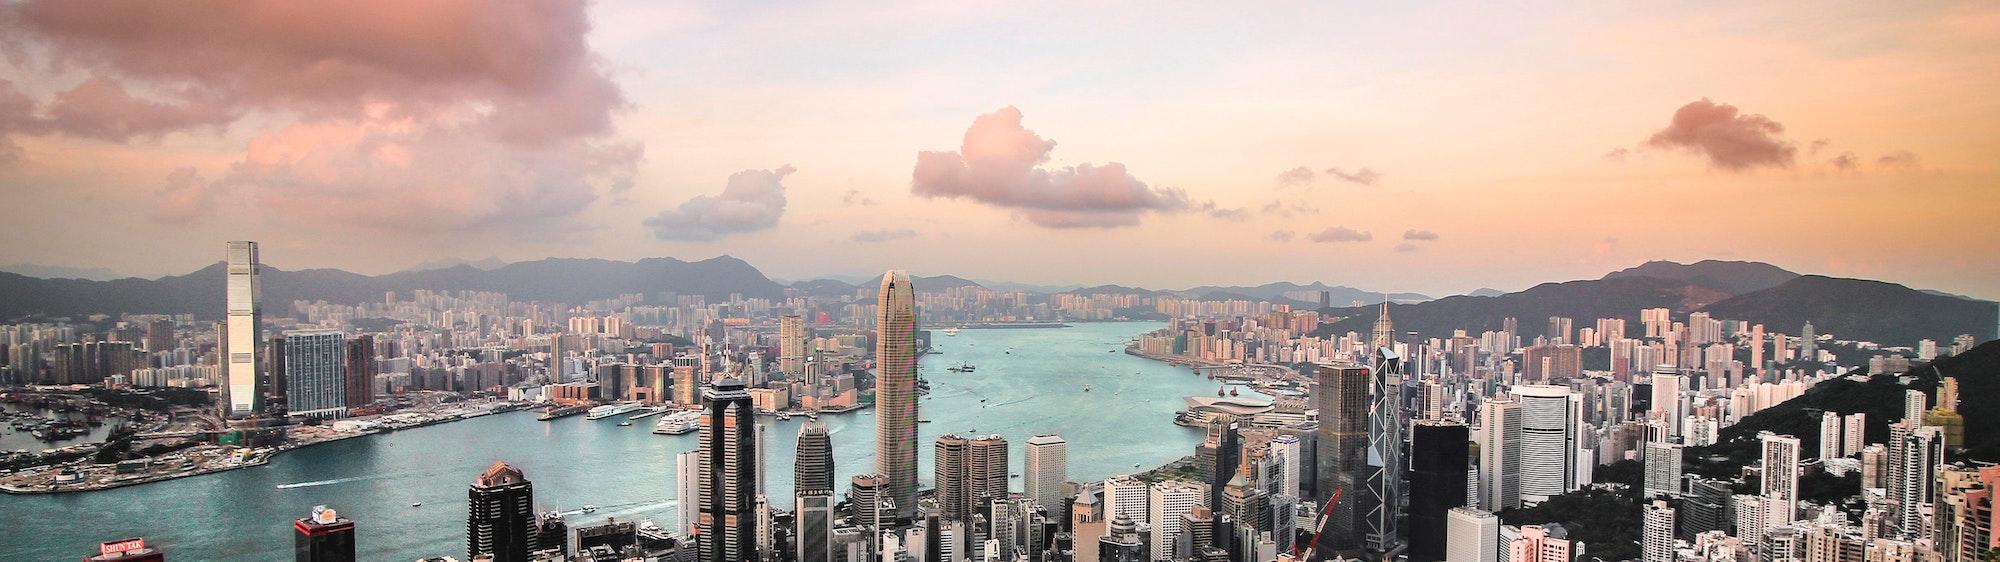 Hong Kong anti-corruption commission